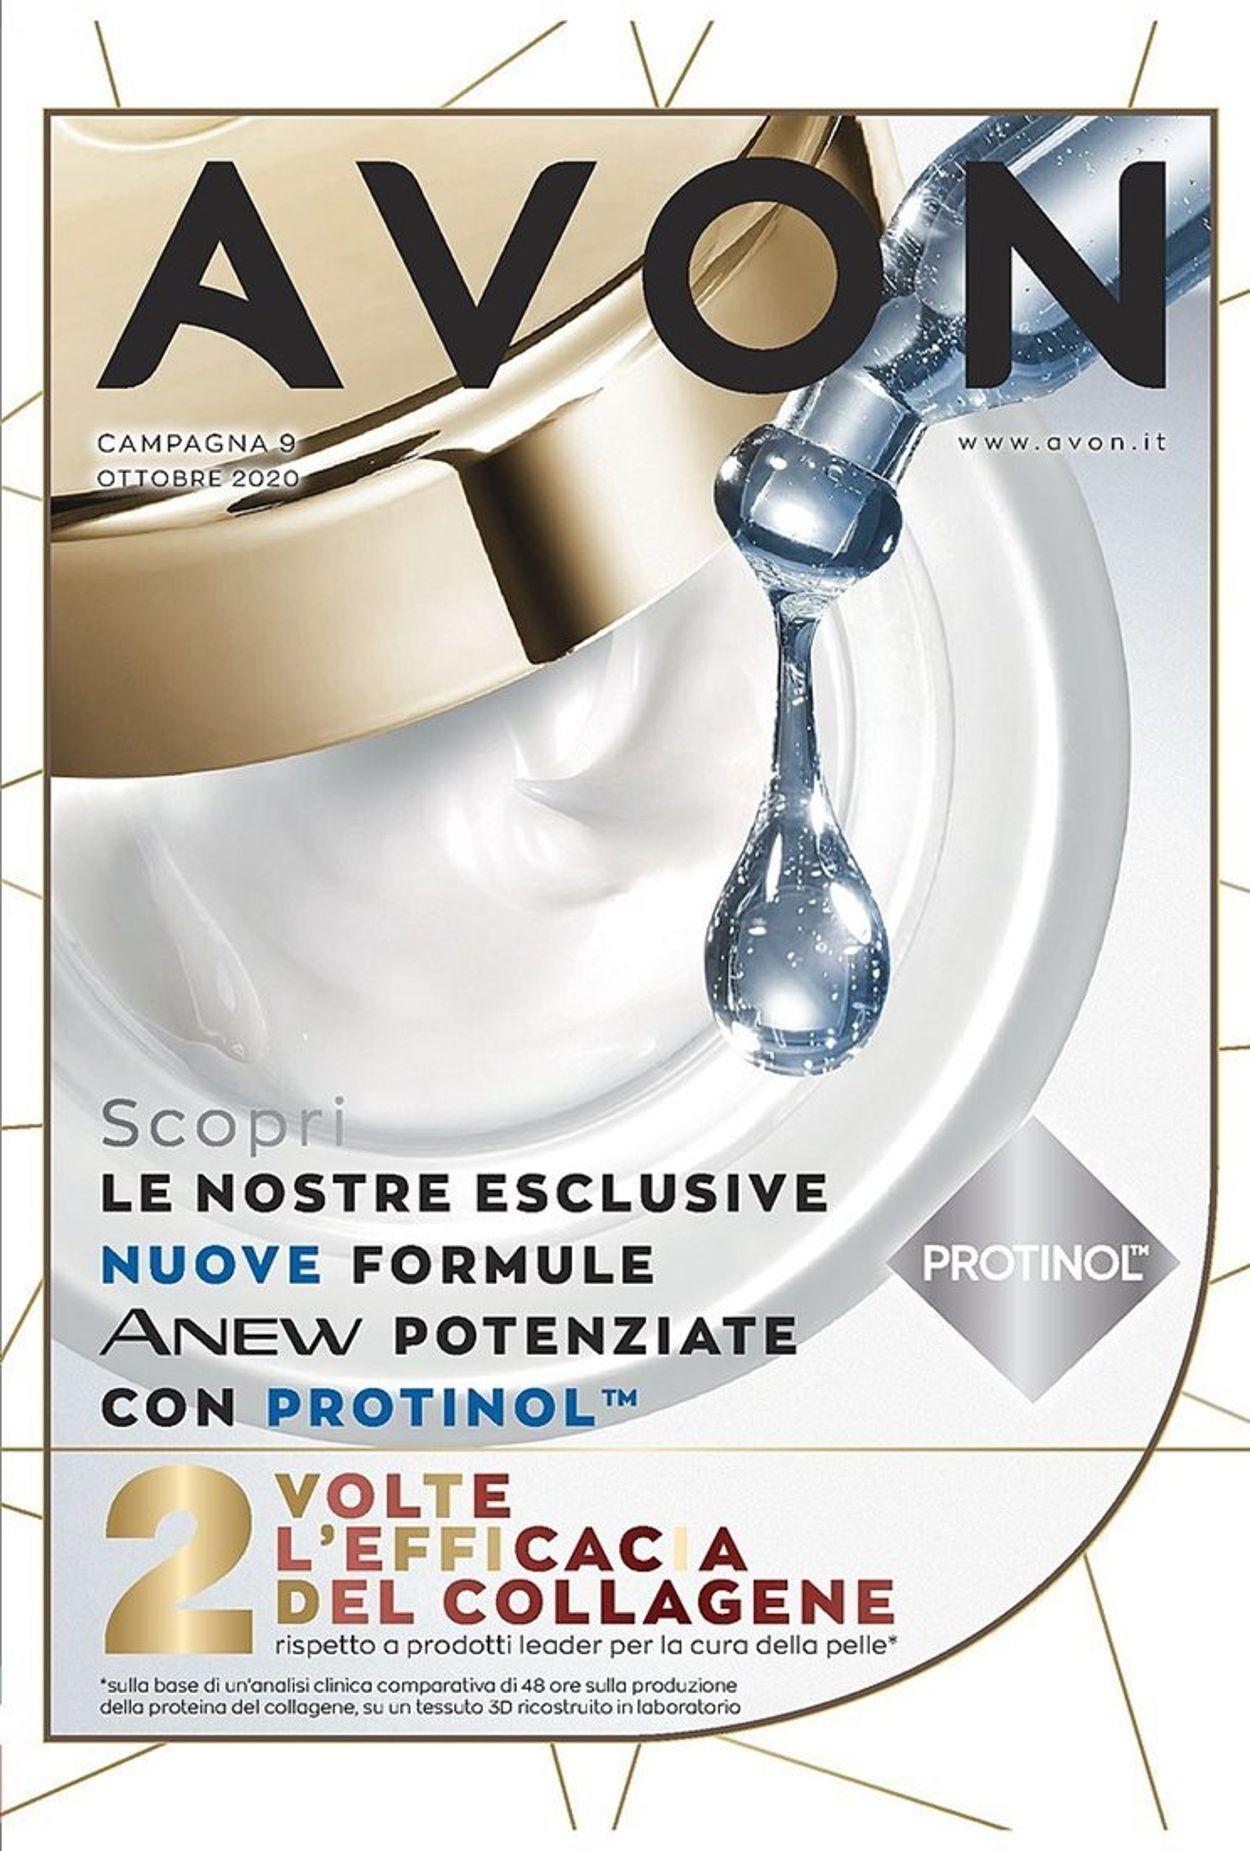 Volantino Avon - Offerte 01/10-31/10/2020